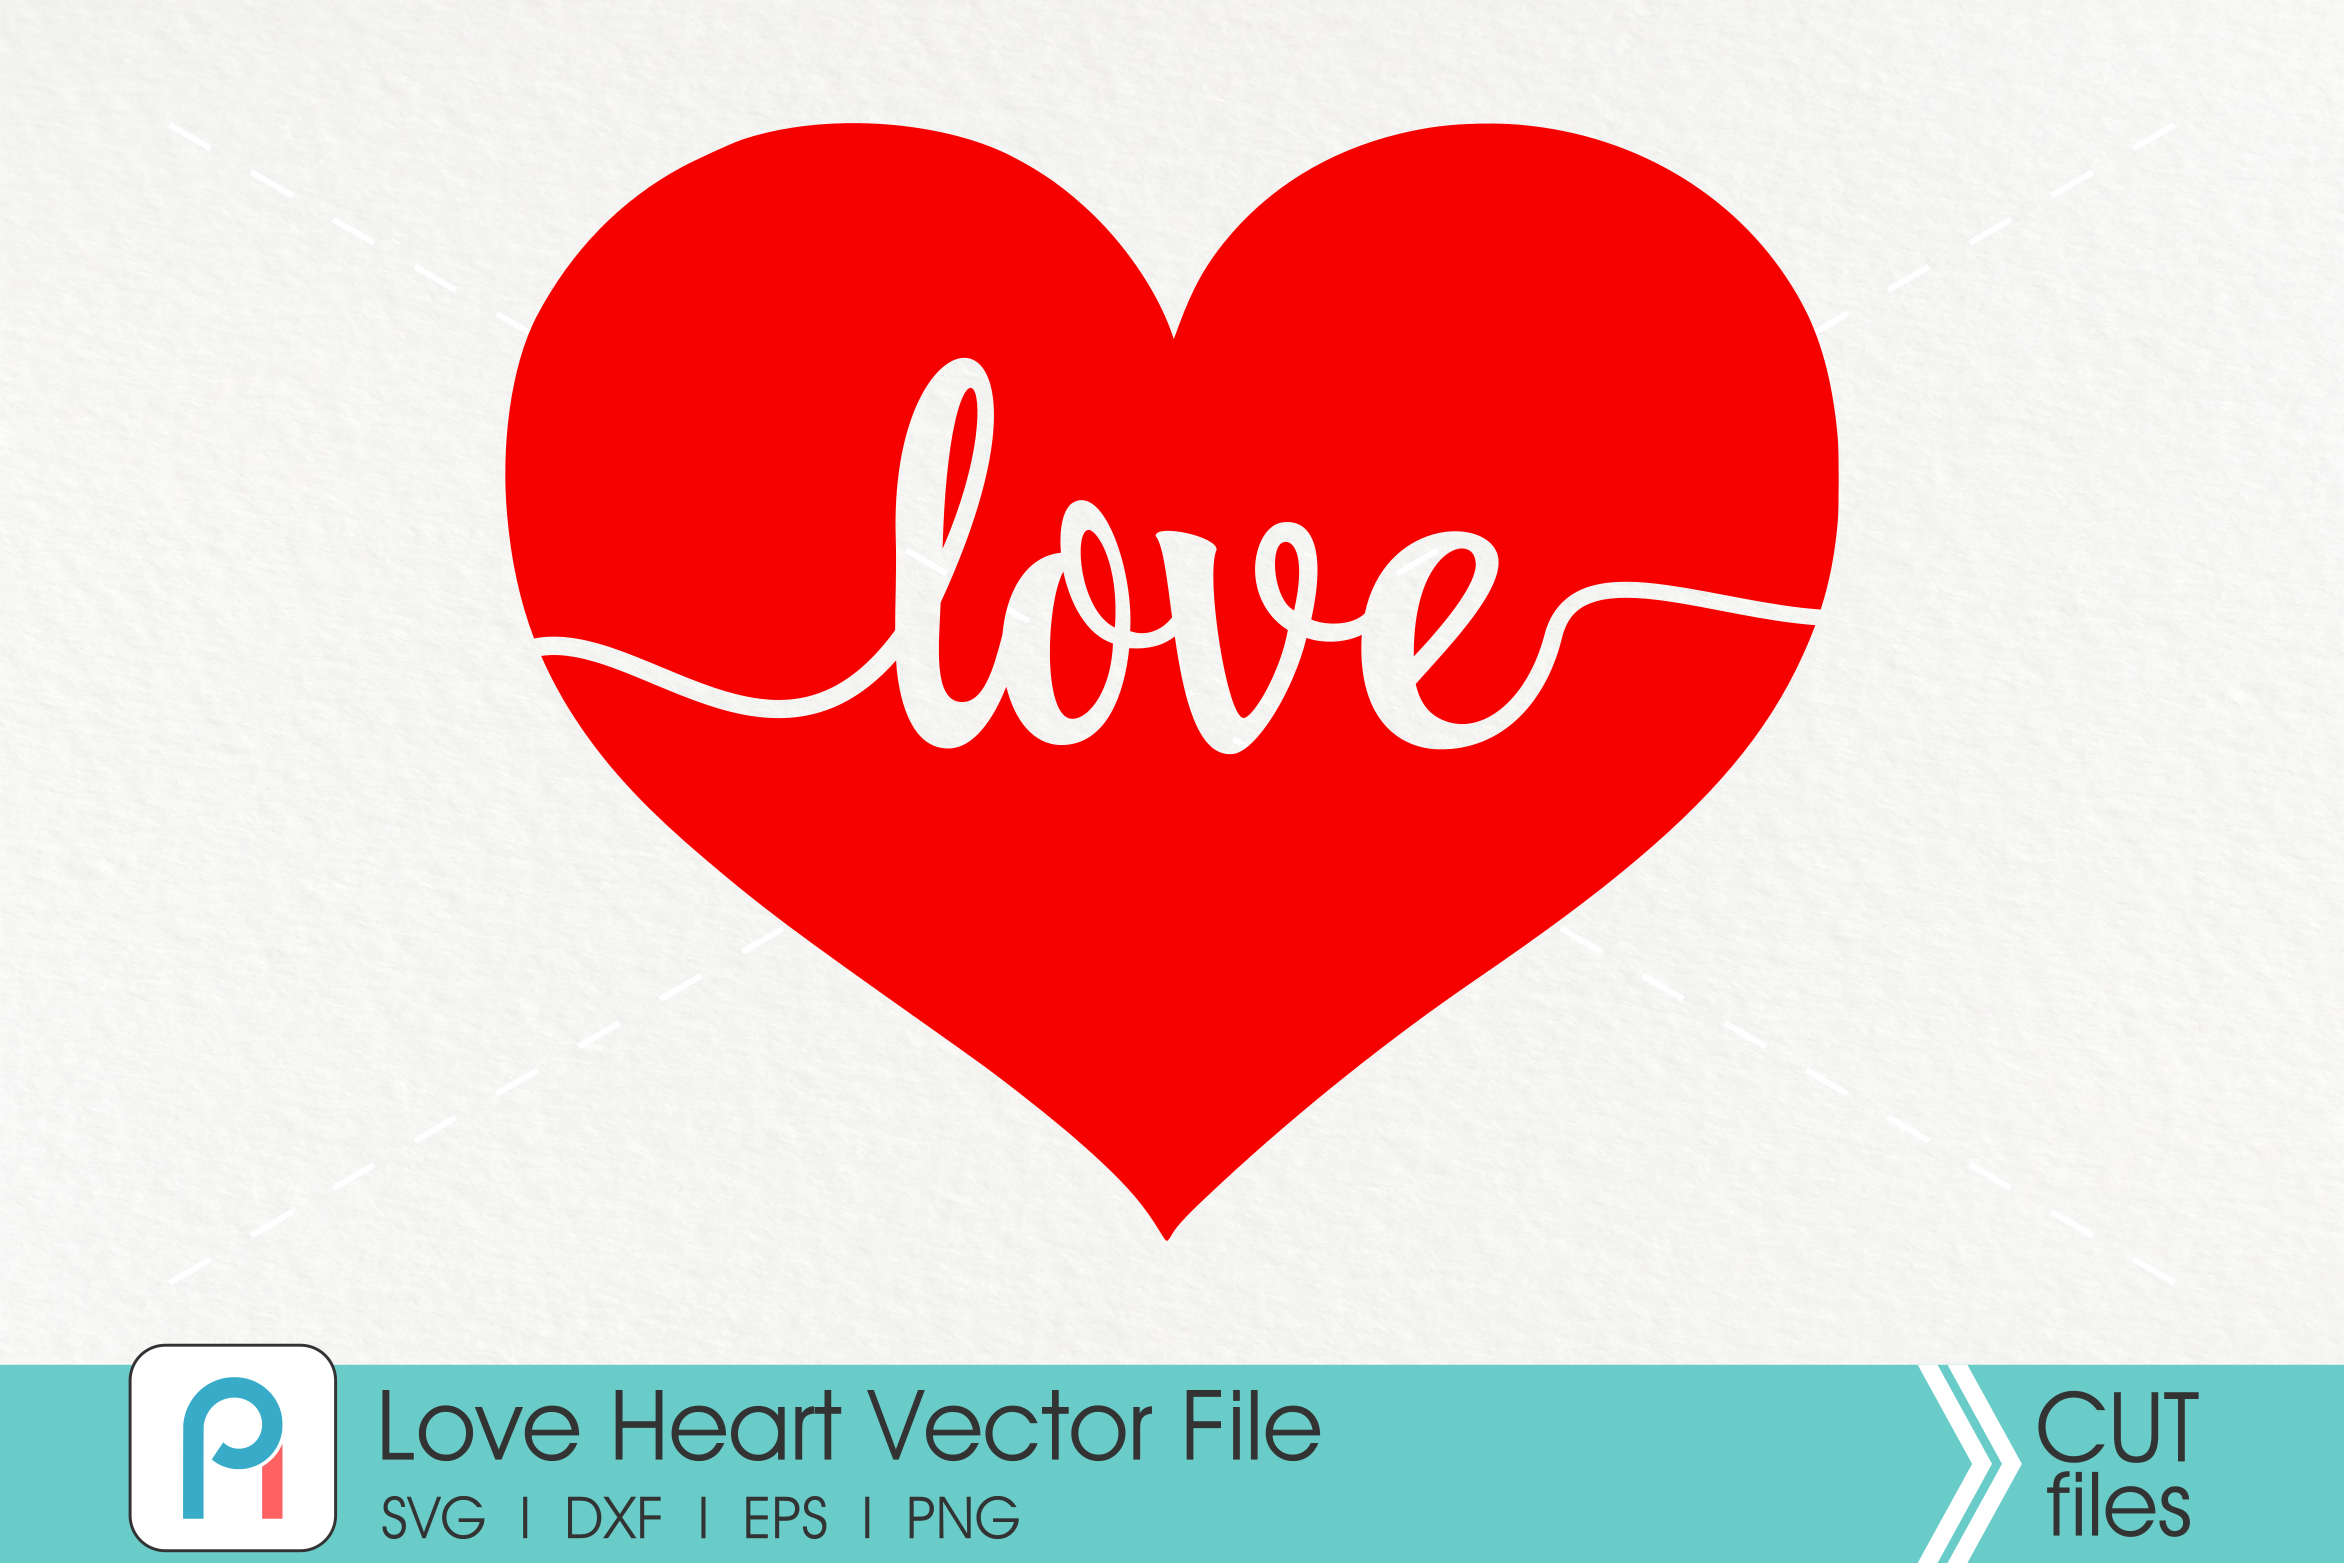 Love Svg, Heart Svg, Love Heart Svg, Valentine's Day Svg example image 1